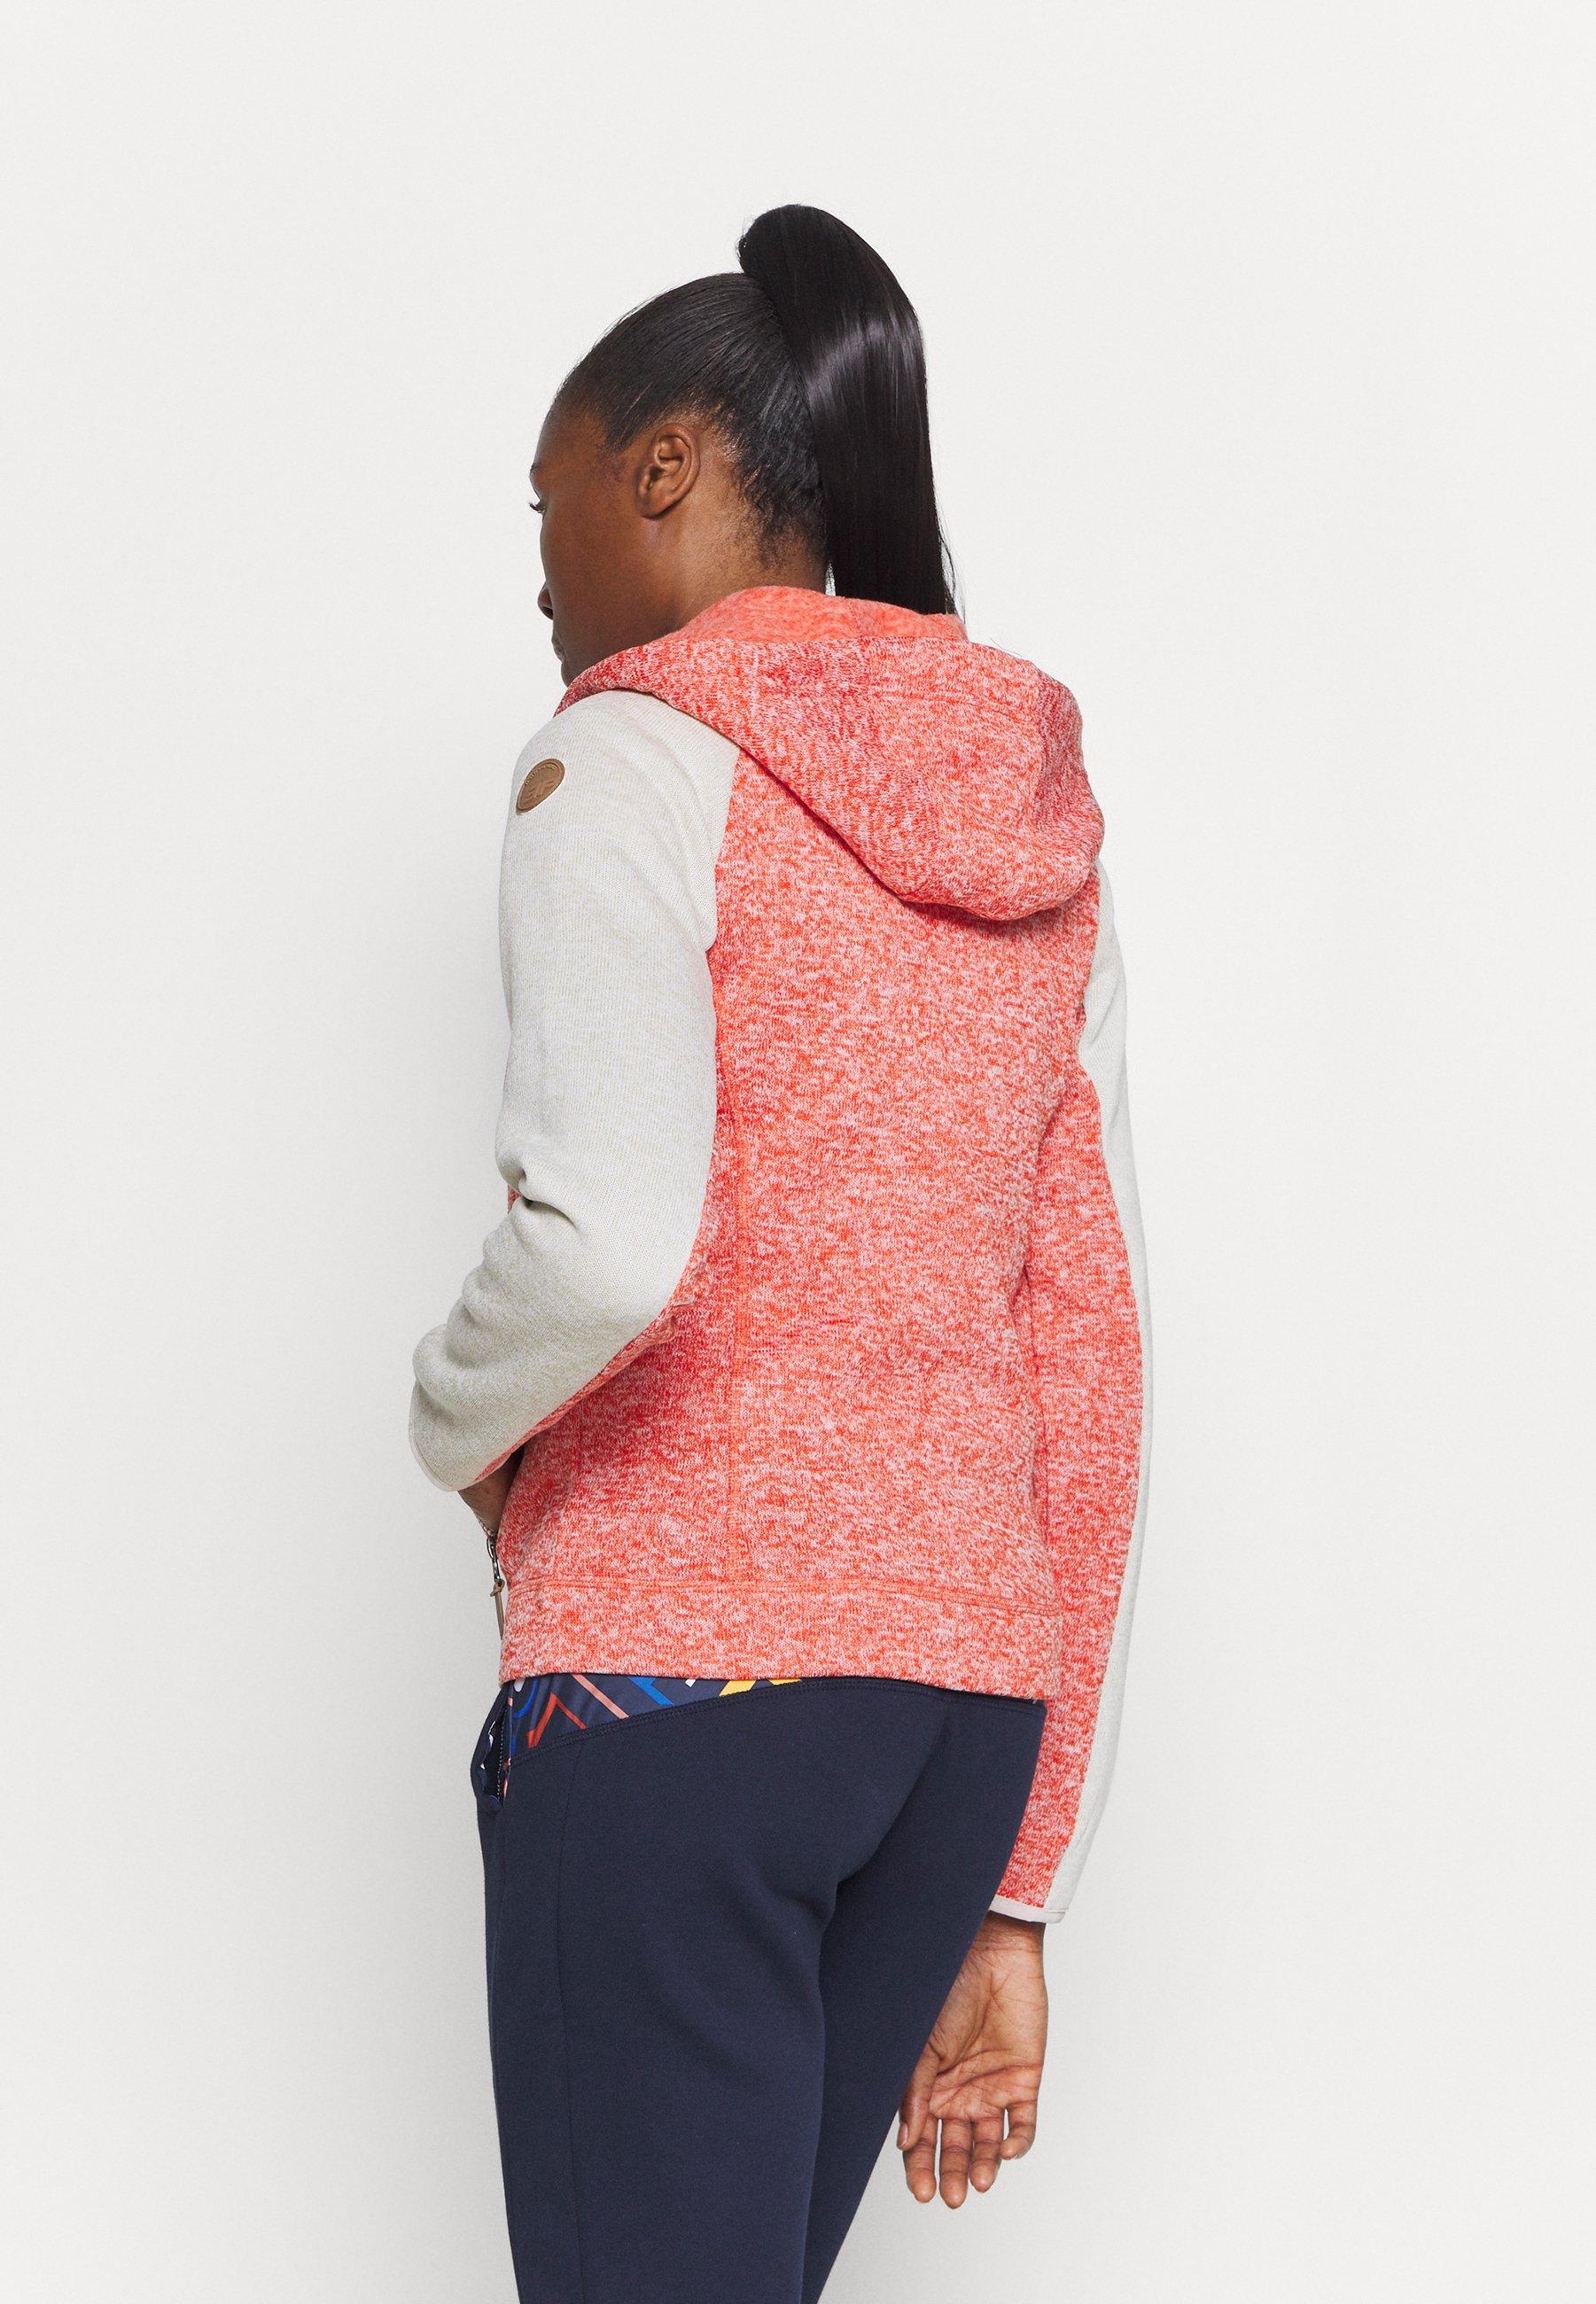 Icepeak AUBURN - Fleece jacket - coral red zP3dT